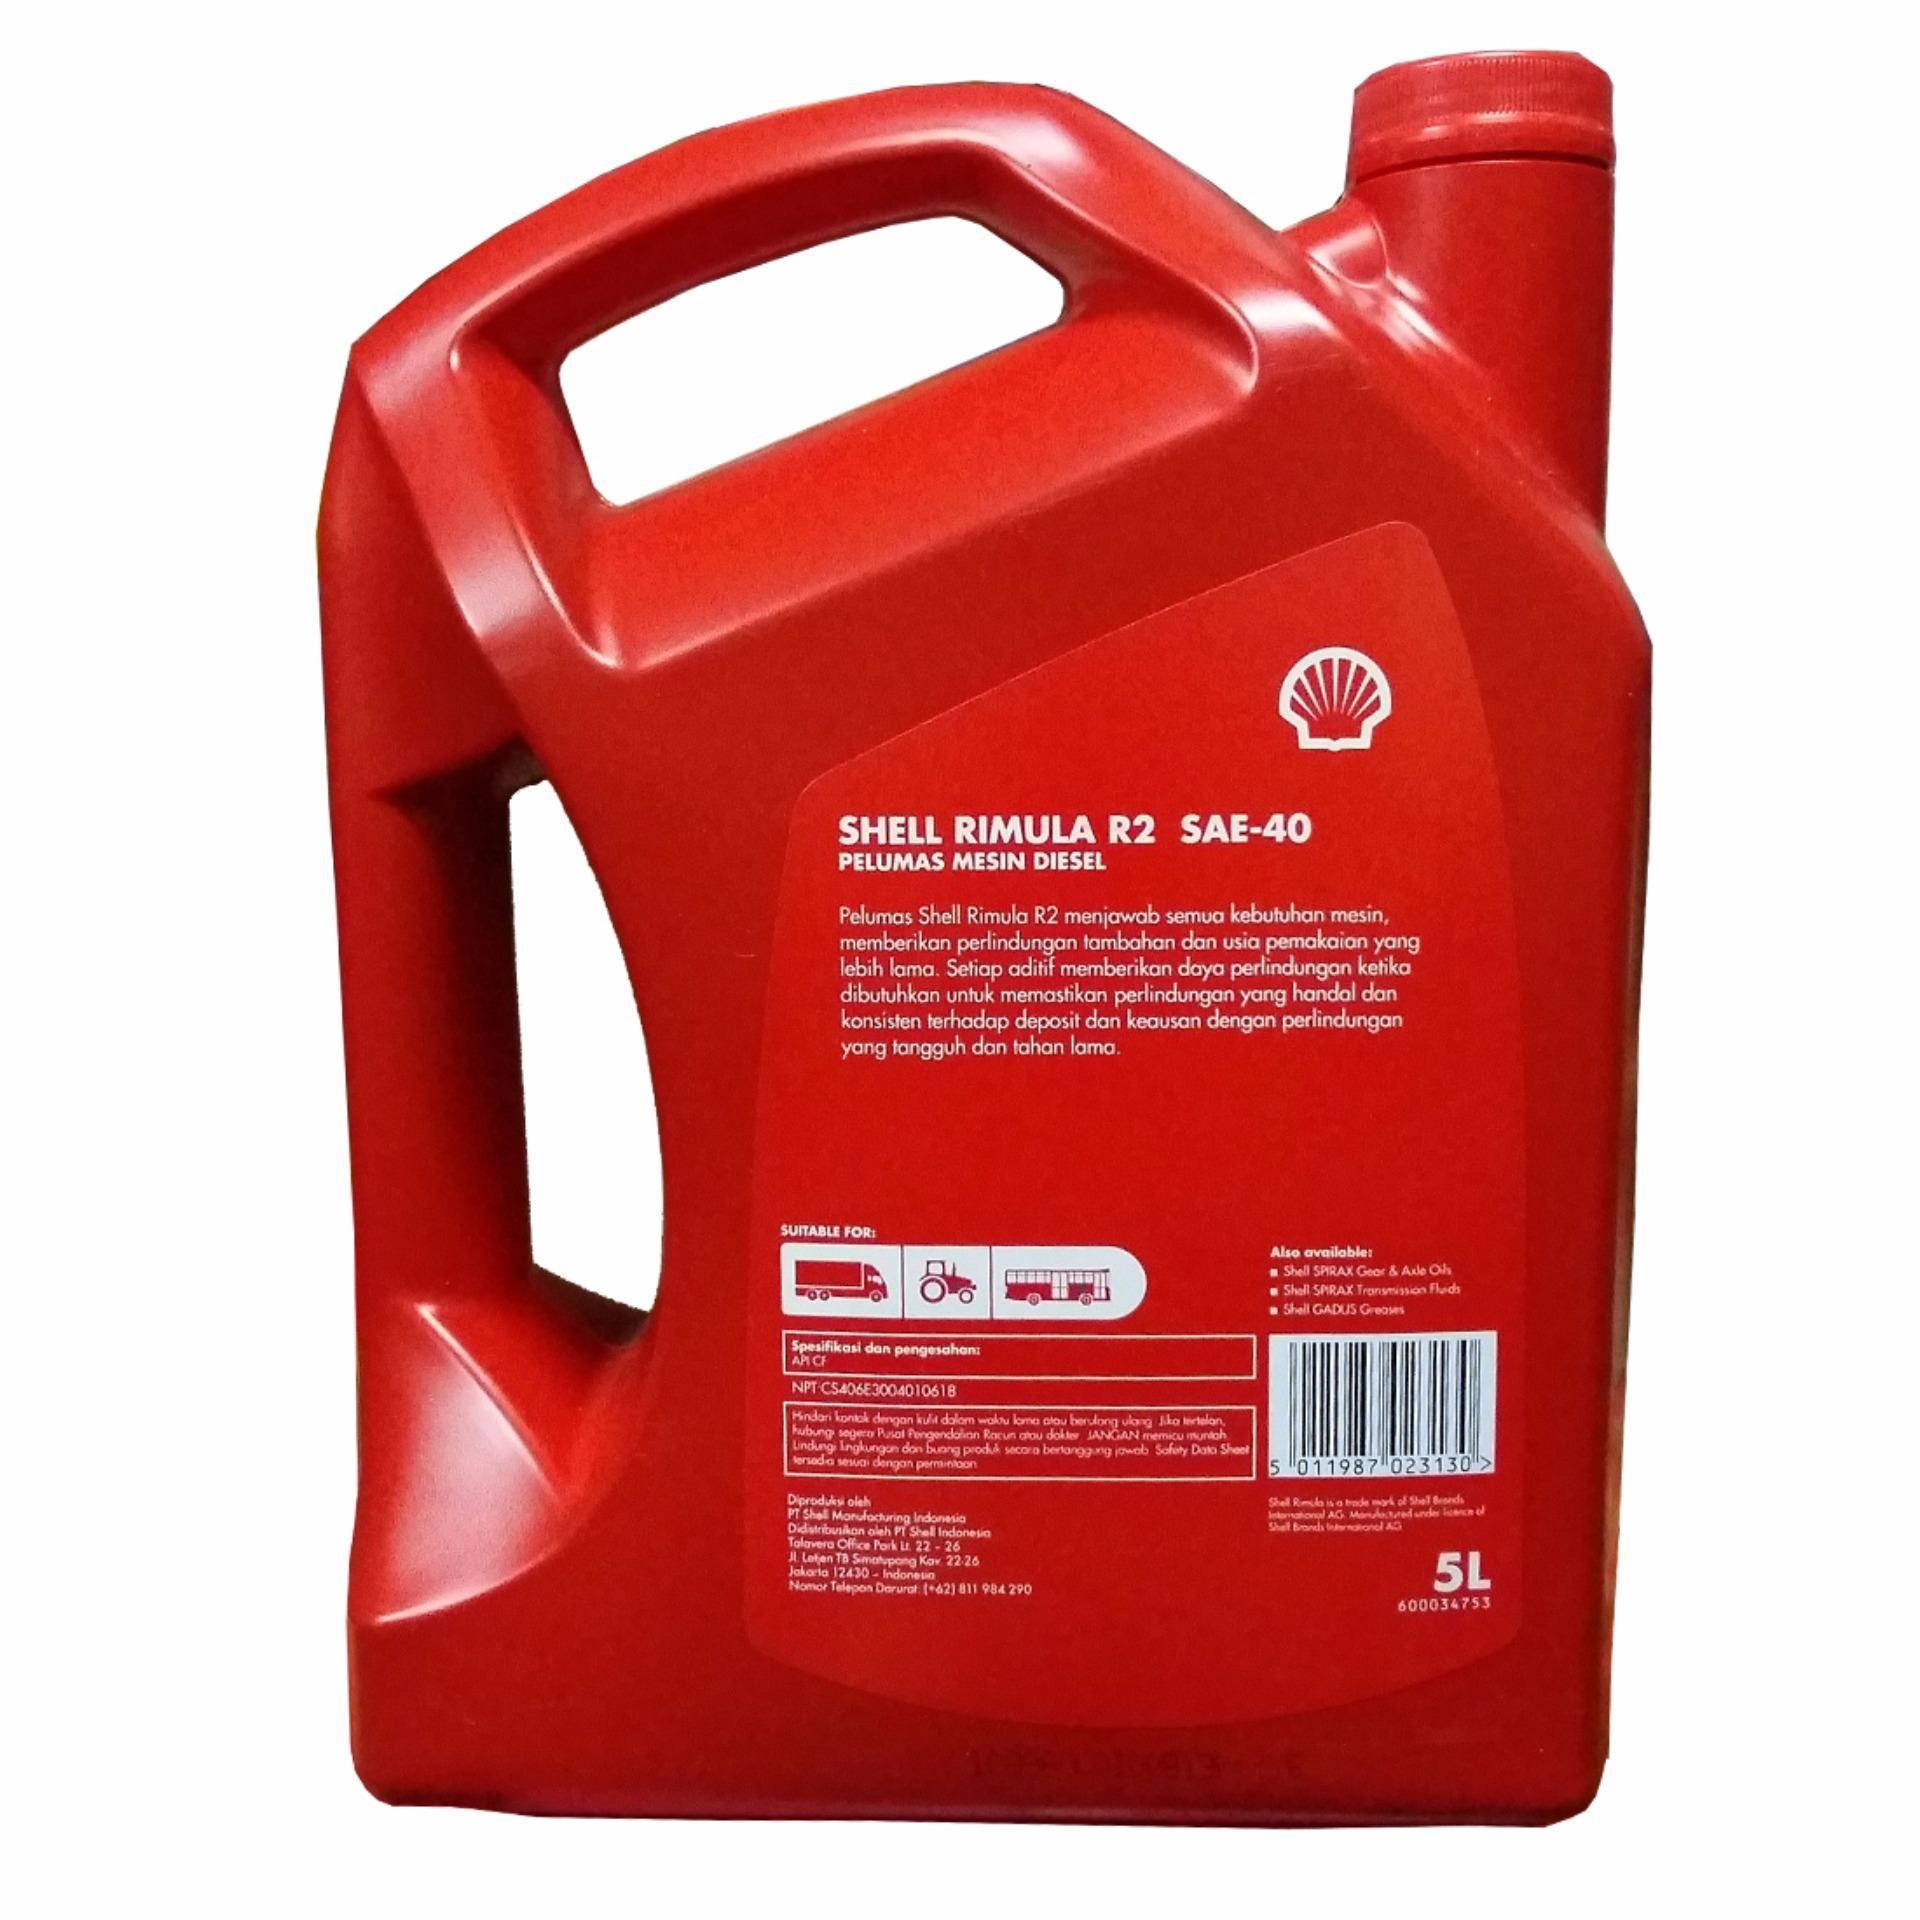 Pencarian Termurah Shell Rimula R2 Sae 40 Pelumas Oli Mesin Mobil Helix Ultra 5w Api Sn Cf Fully Synthetic Oil 4 Liter Diesel 5